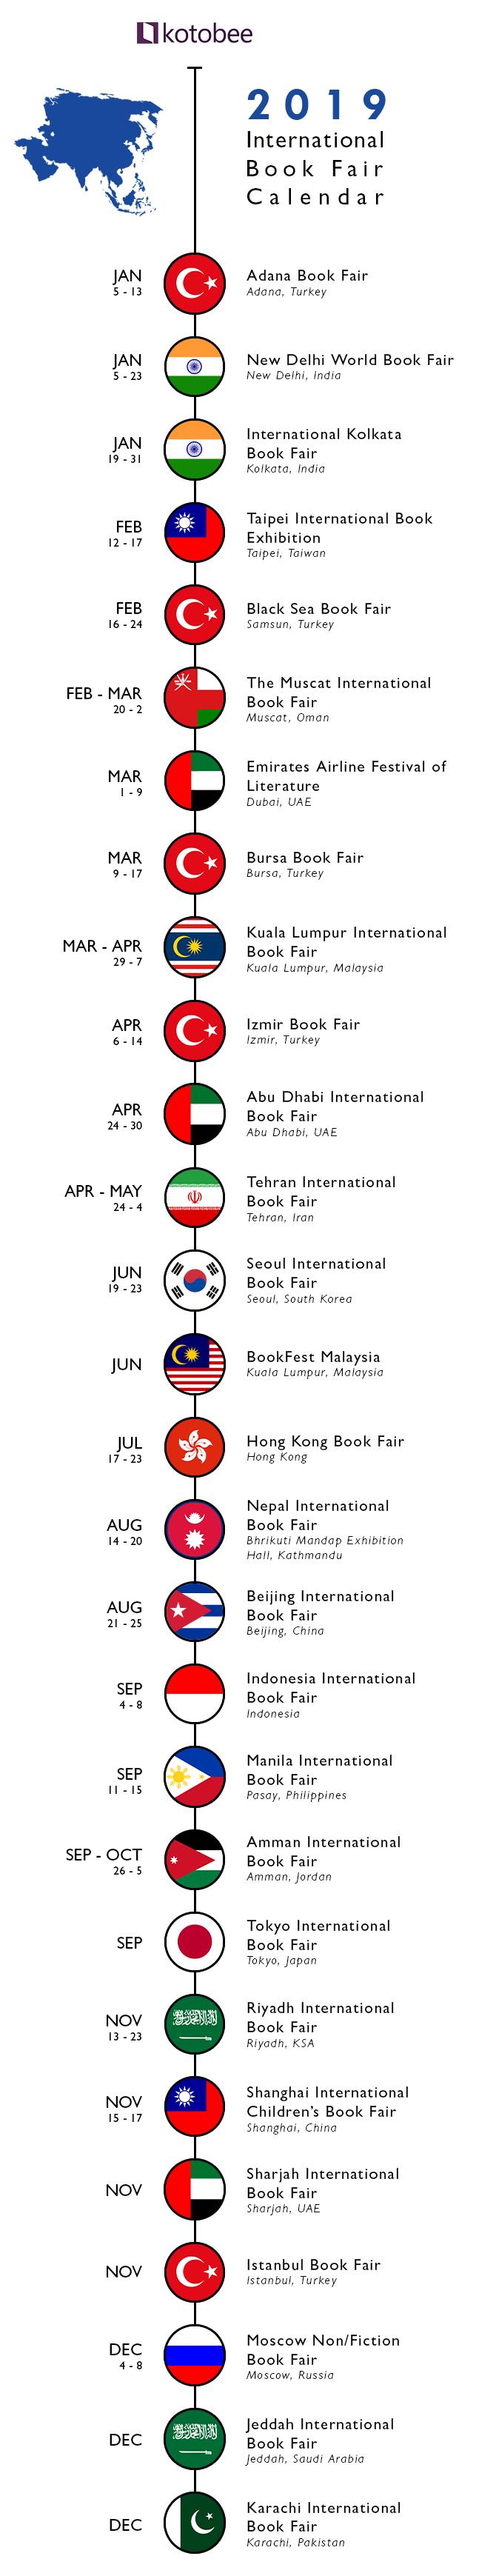 book fairs---ASIA